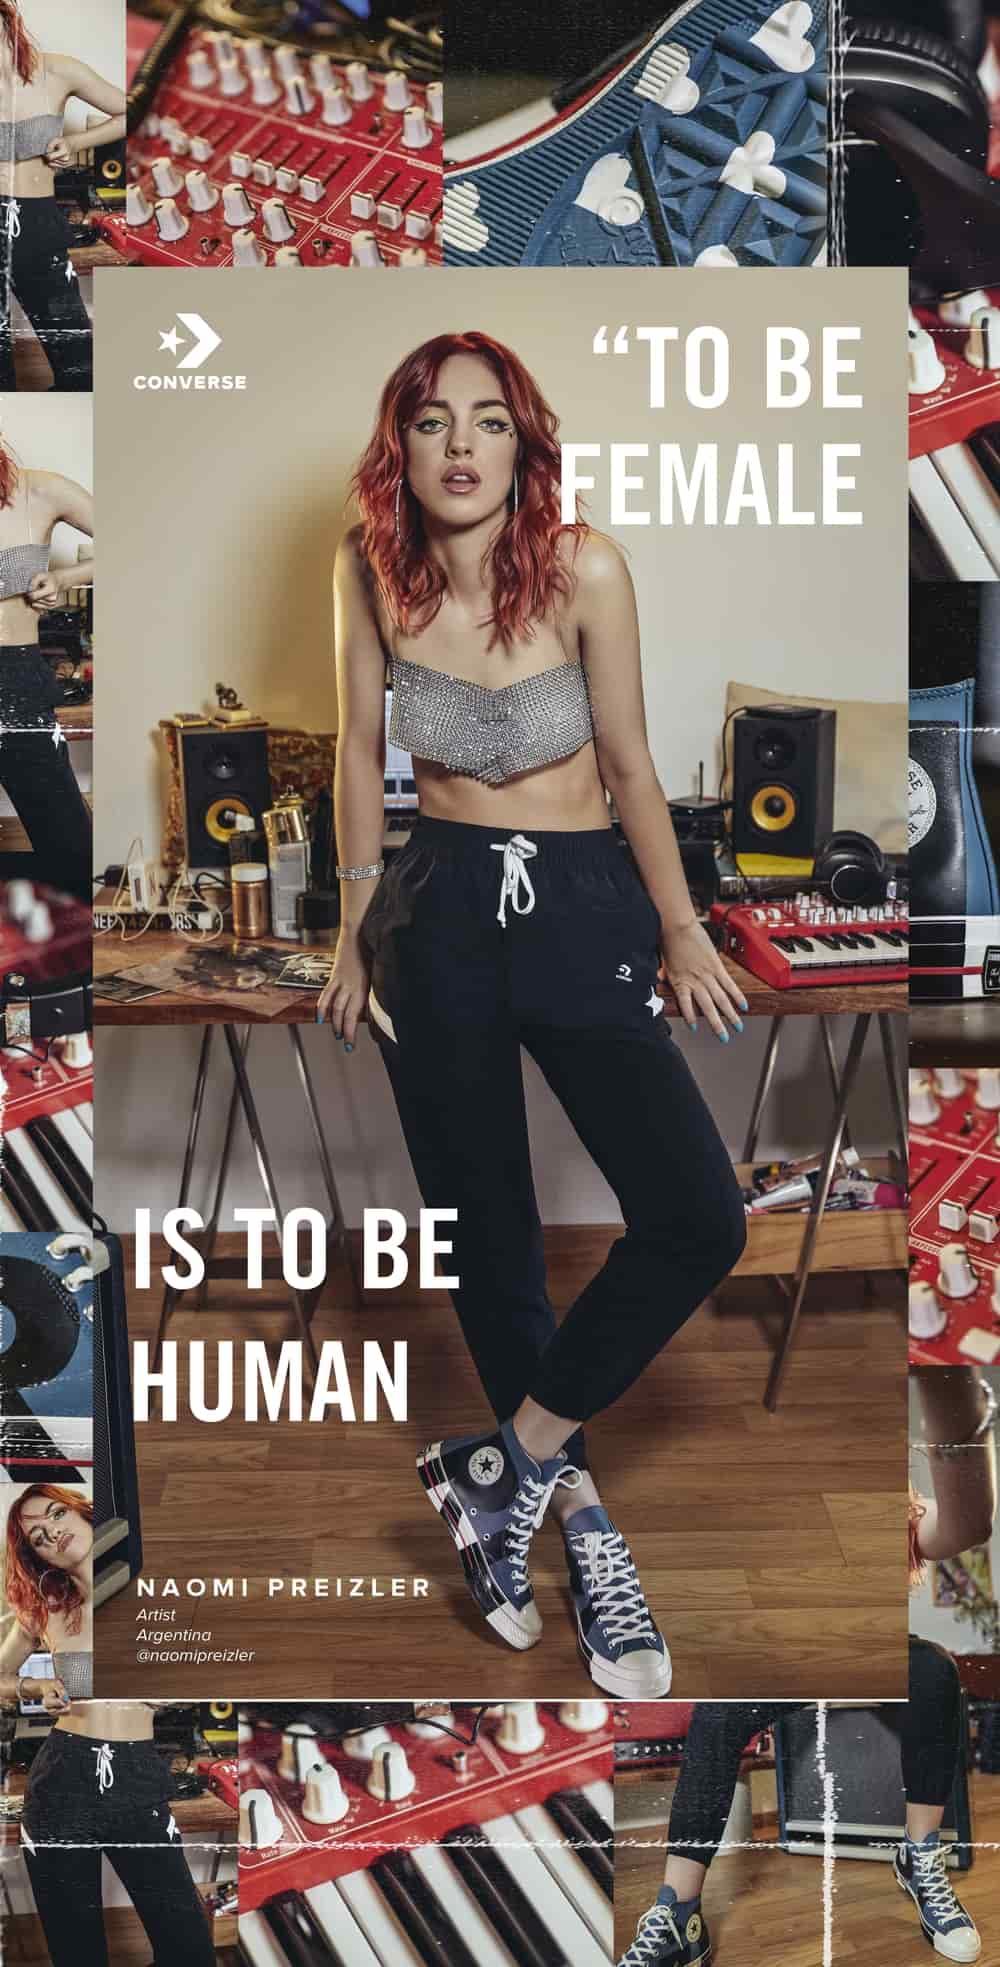 Koleksi Baru Converse Terinspirasi Ikon Wanita Kuat